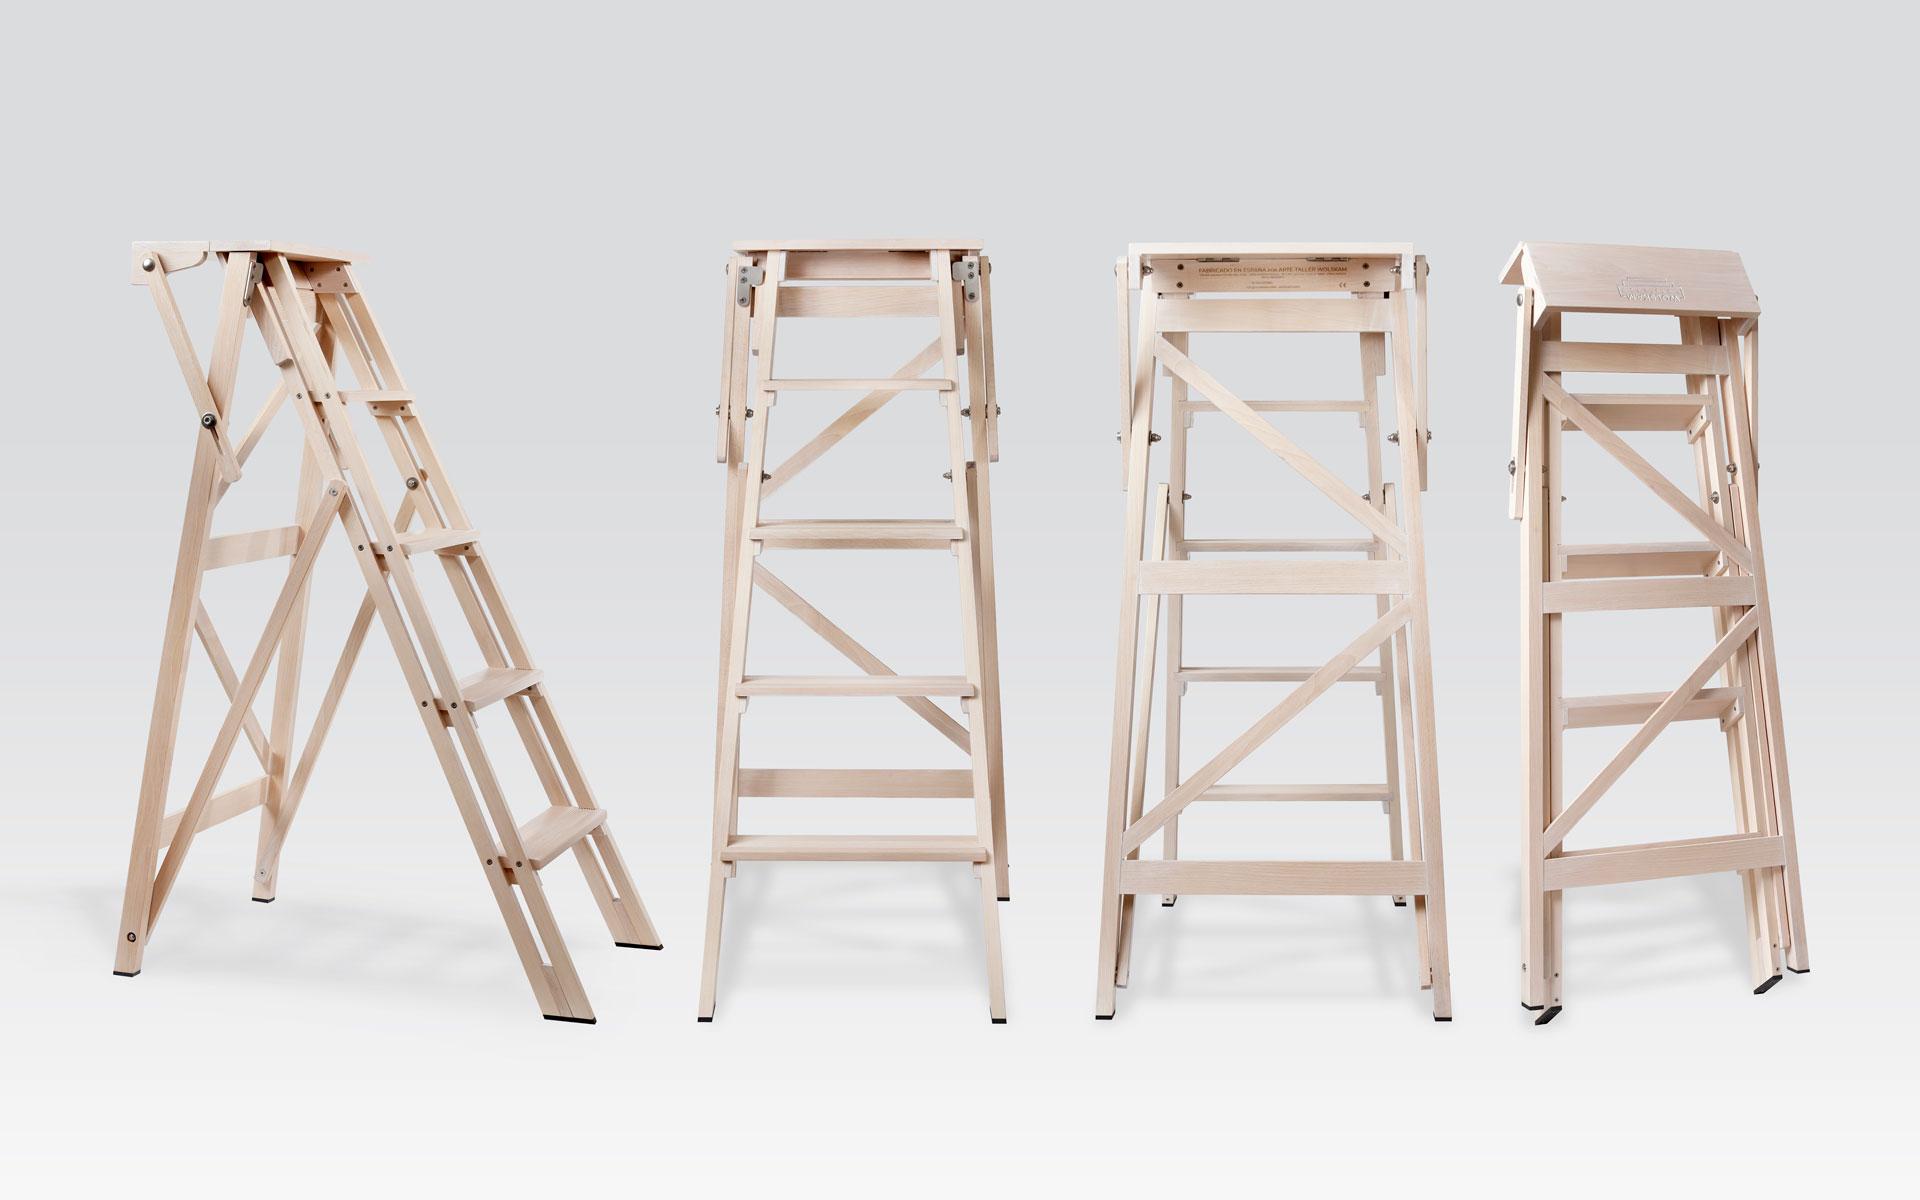 Escalera decorativa blanca de madera wolskam systems Escalera decorativa blanca